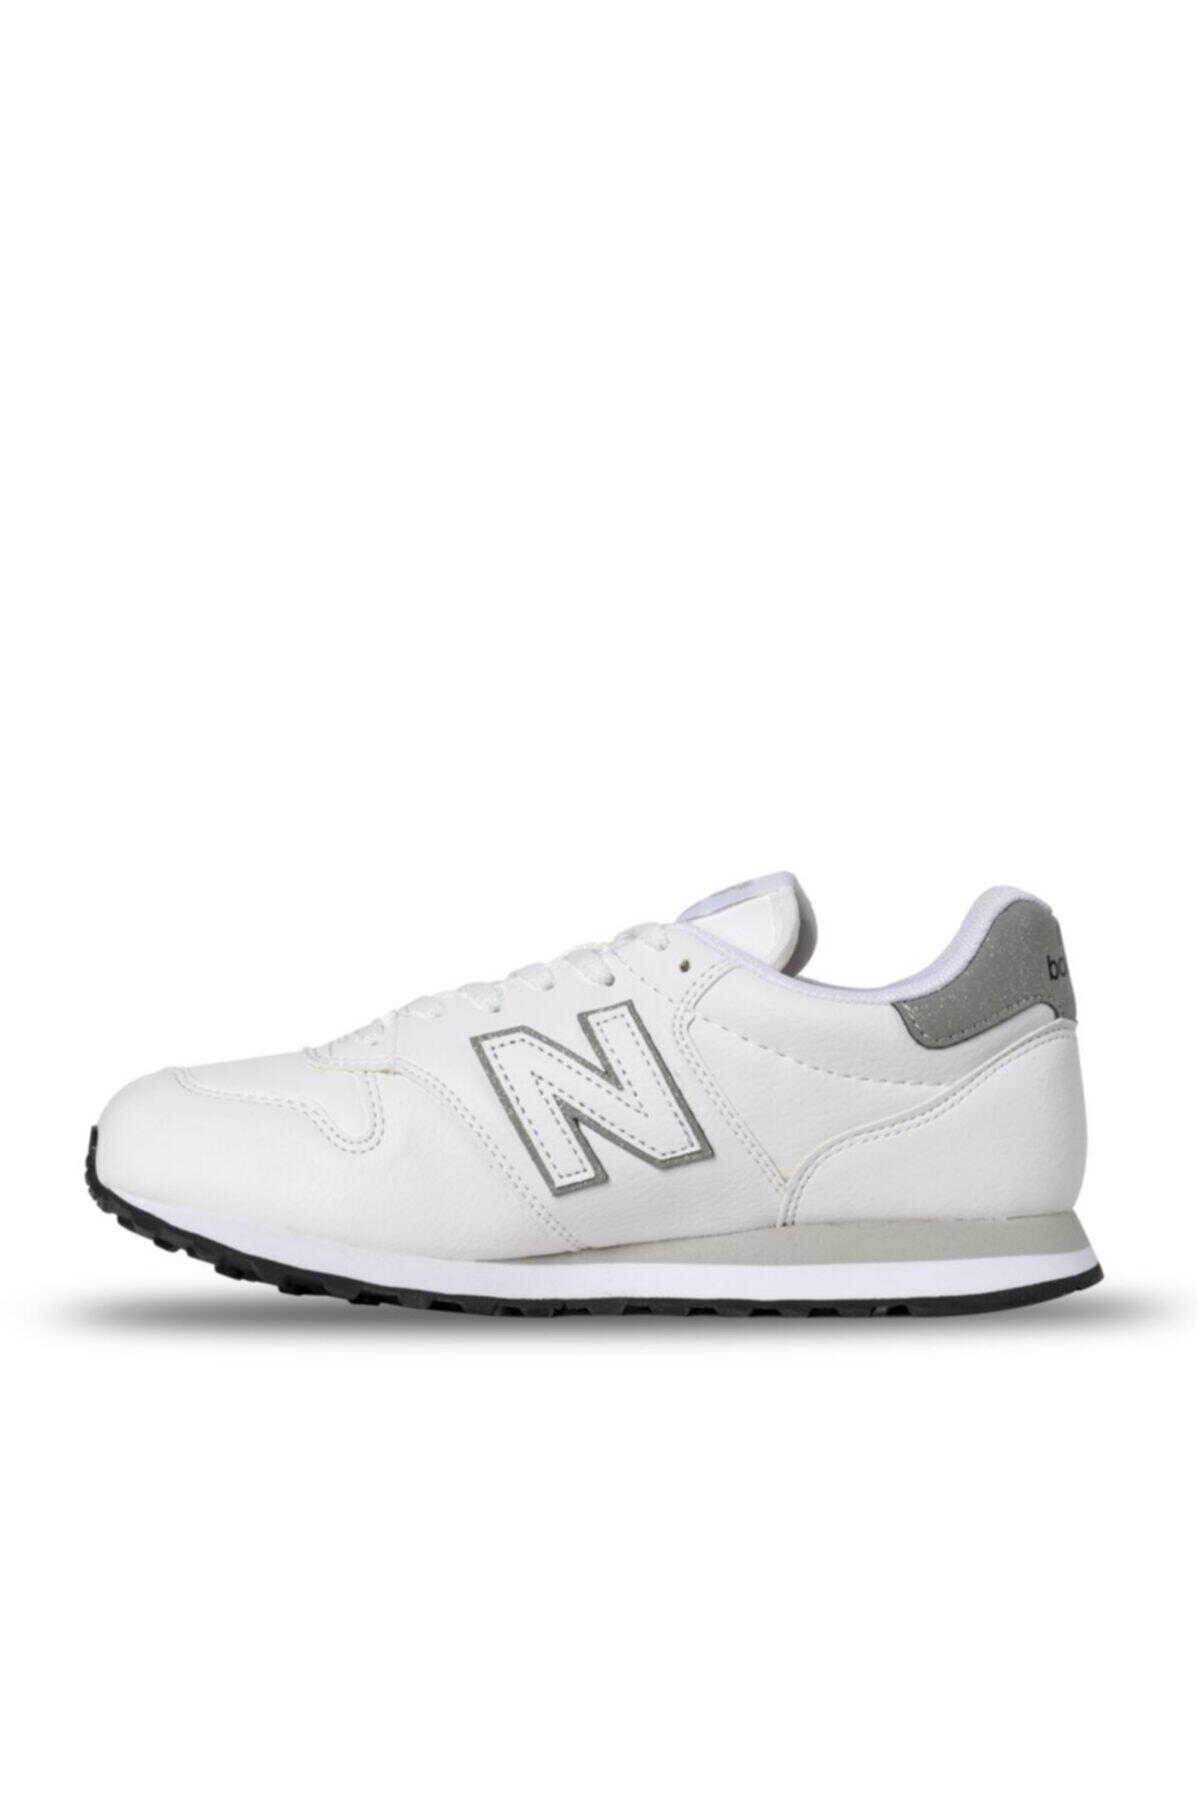 New Balance Kadın Sneaker - Lifestyle - Gw500tly 2